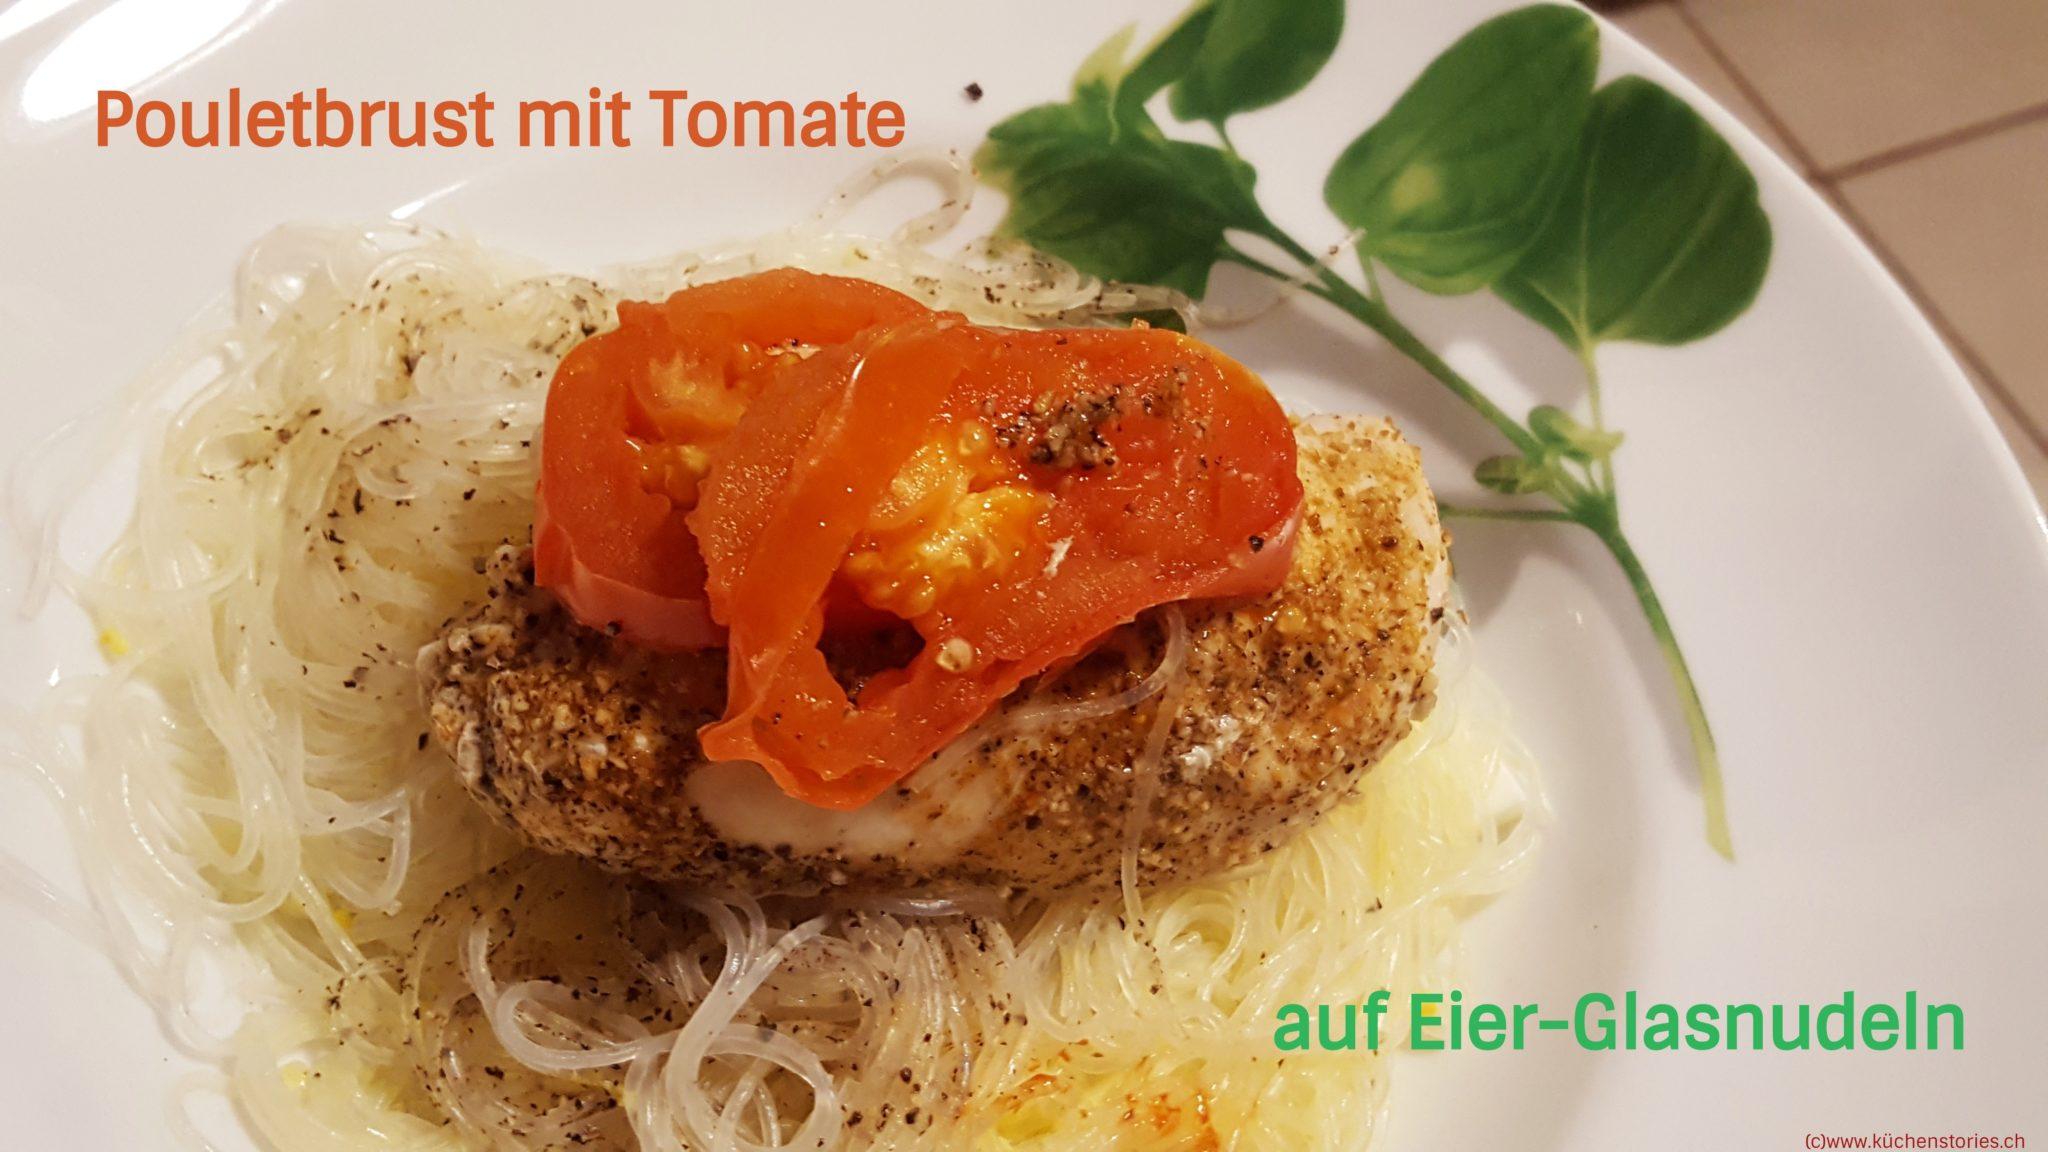 Pouletbrust auf Tomate mit Eierglasnudeln